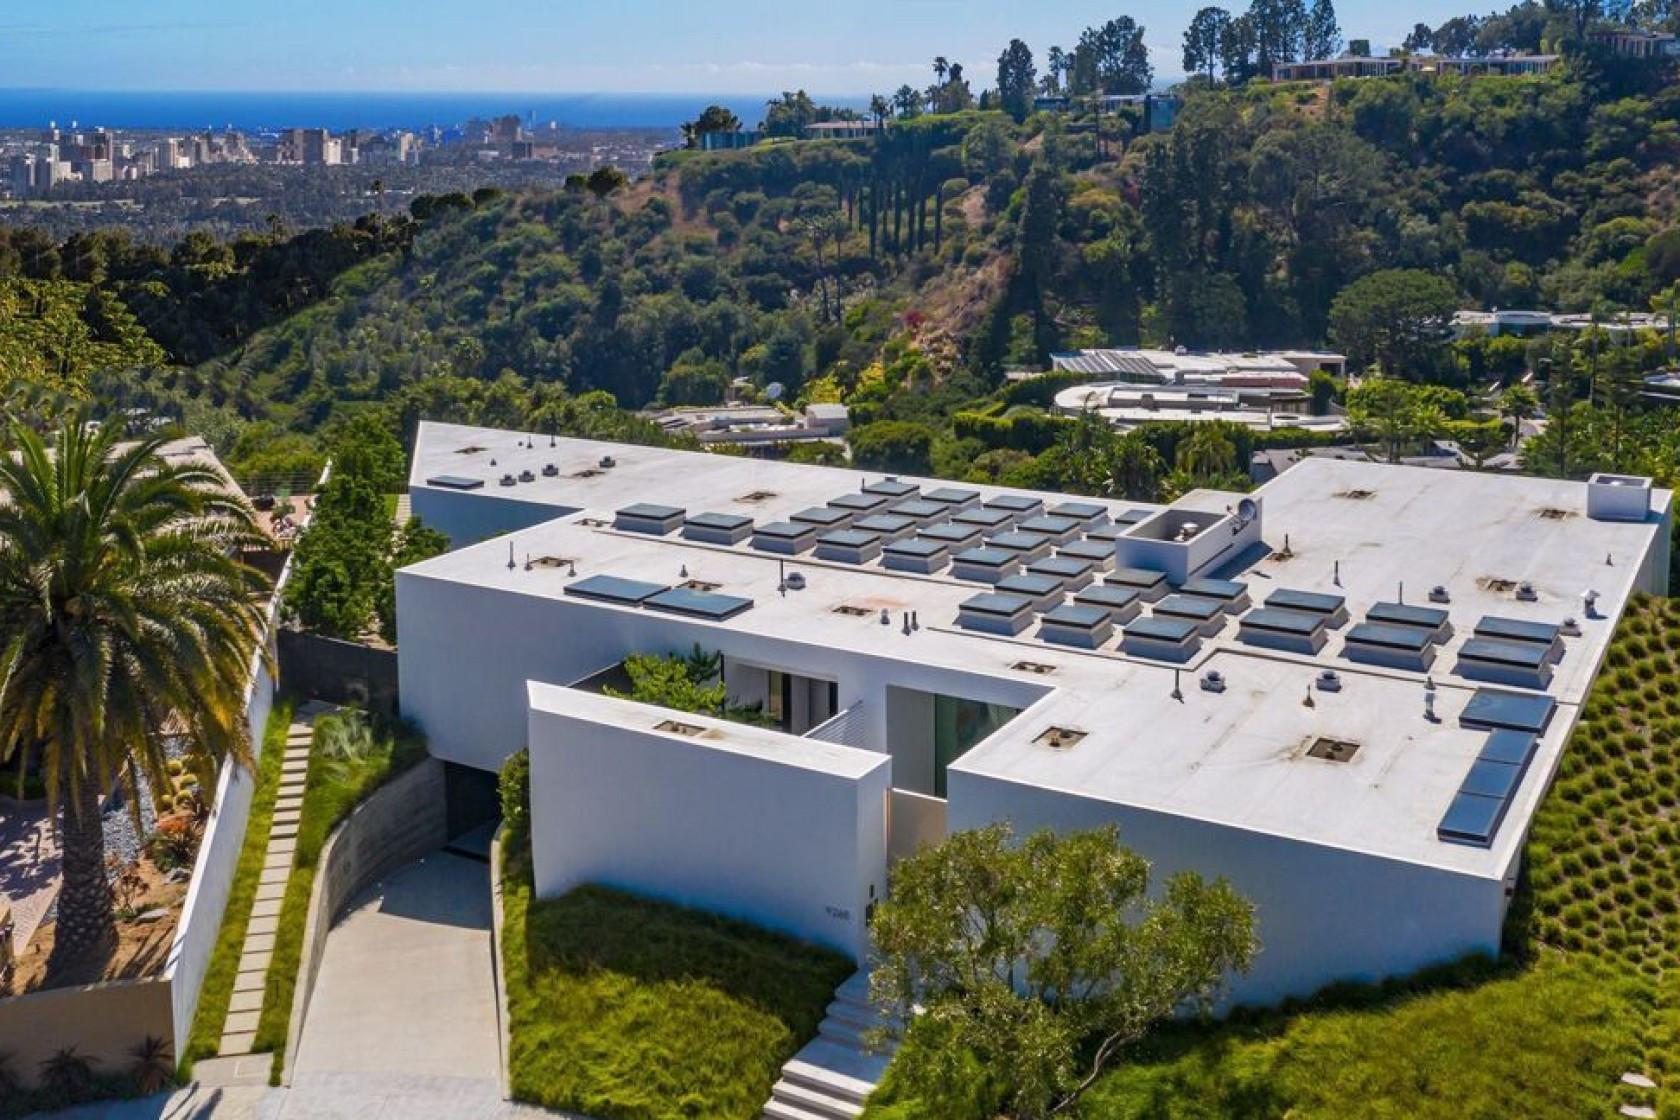 Los Angeles 2028 President Wasserman snaps up $23 million home